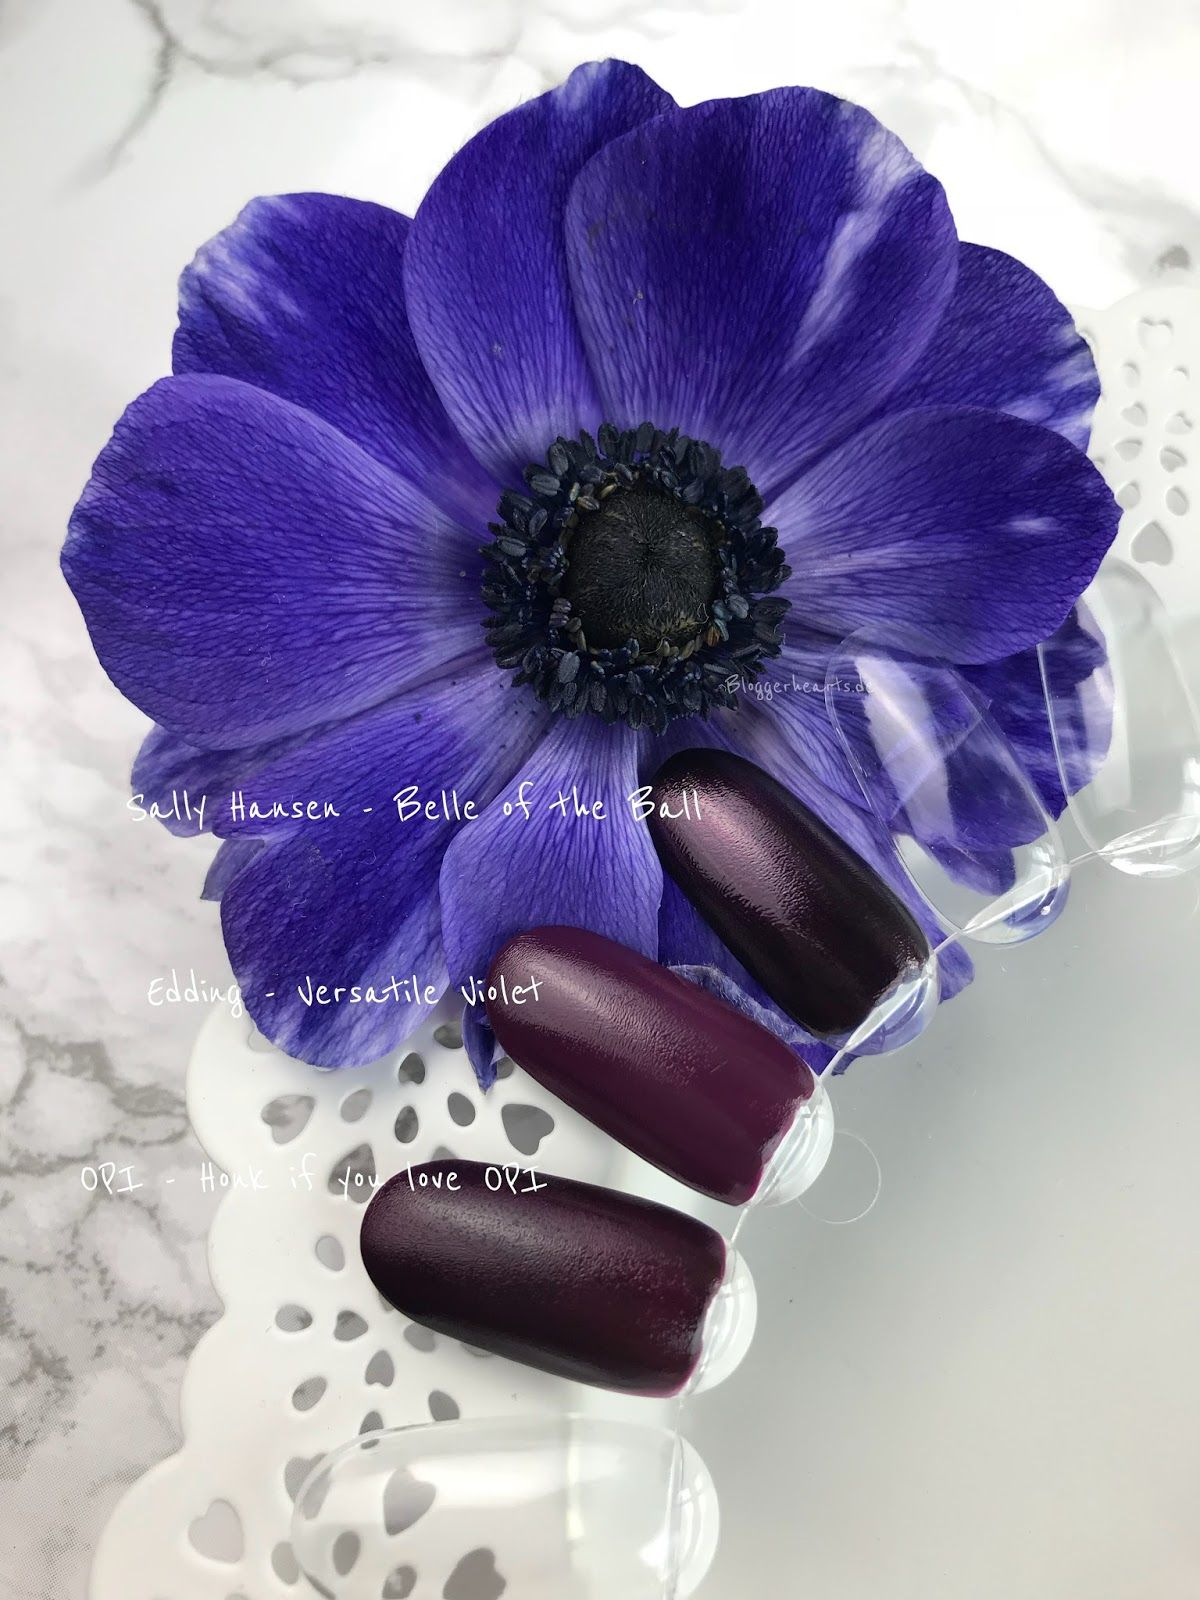 Pantone 2018 Ultra Violet Farbe des Jahrs / Colour of the